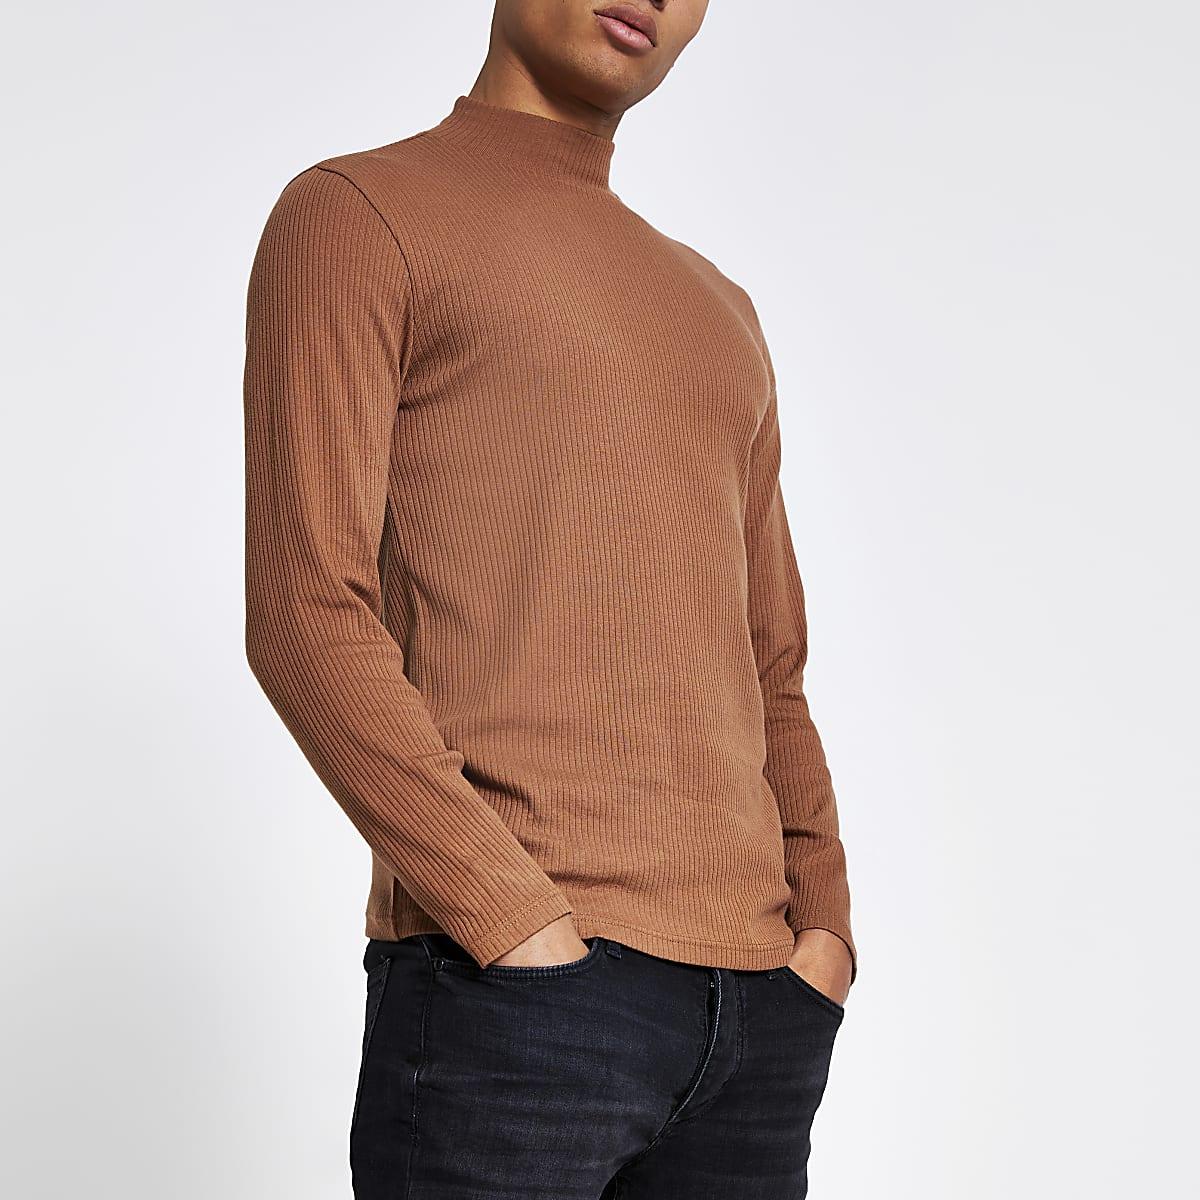 Brown high neck slim fit ribbed top